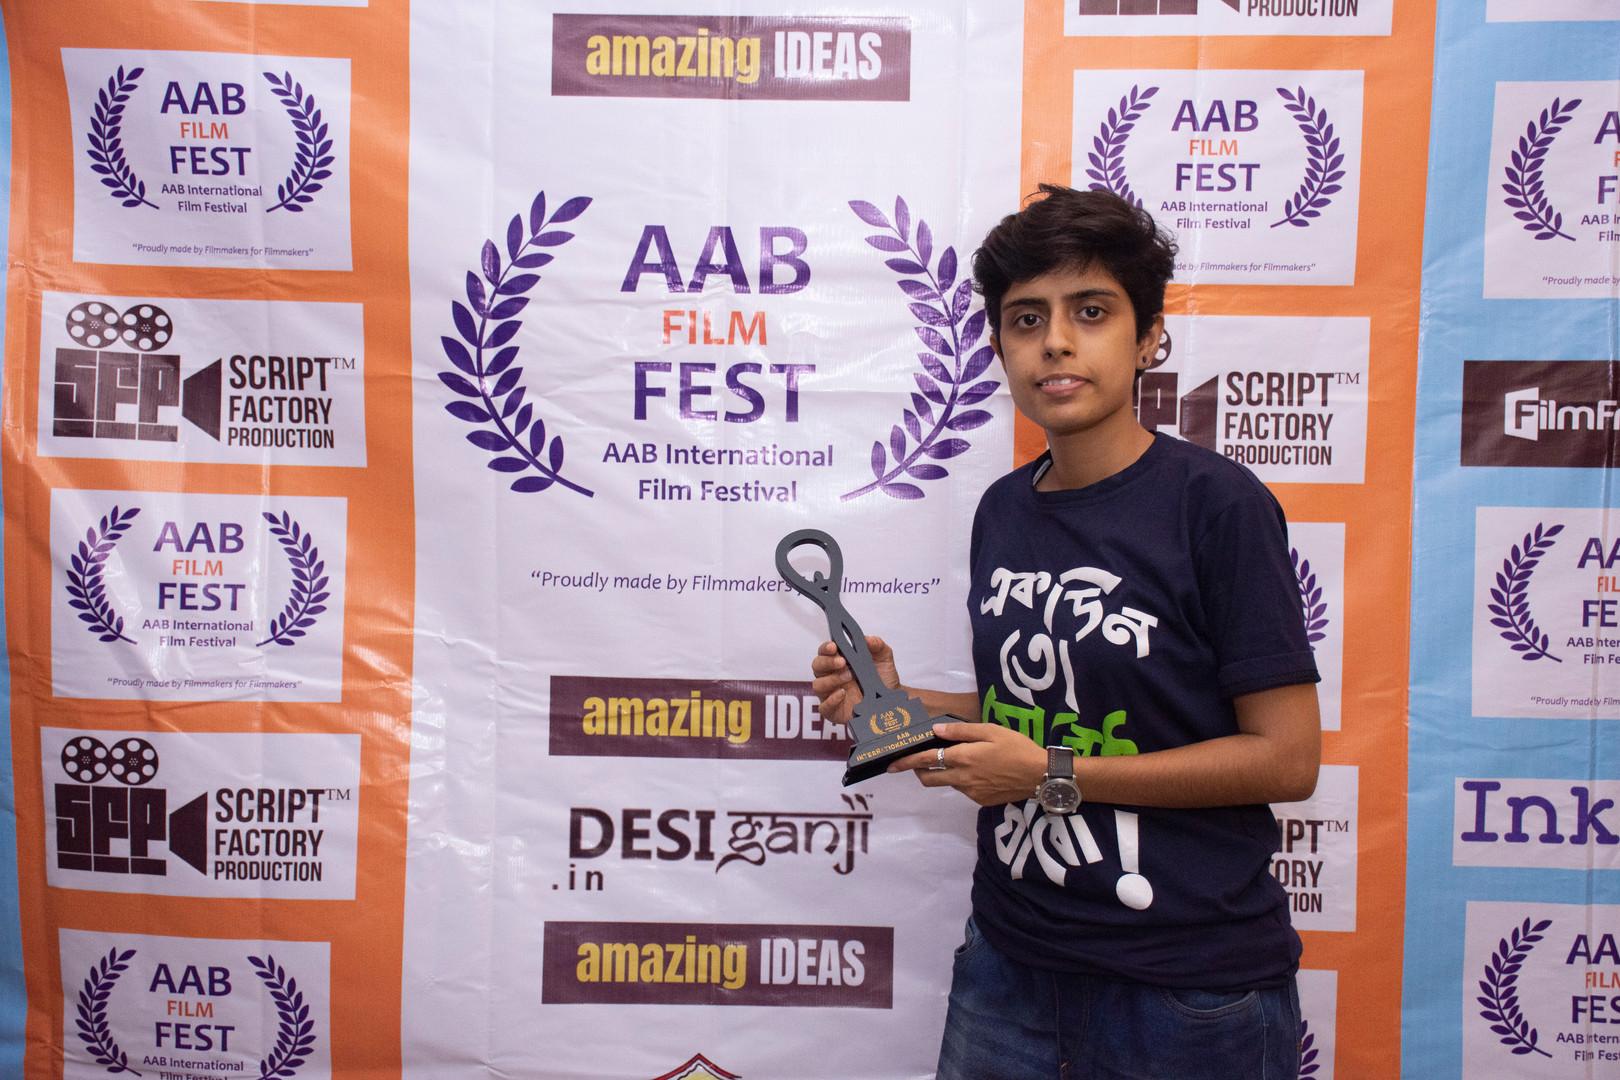 AAB Film Festival